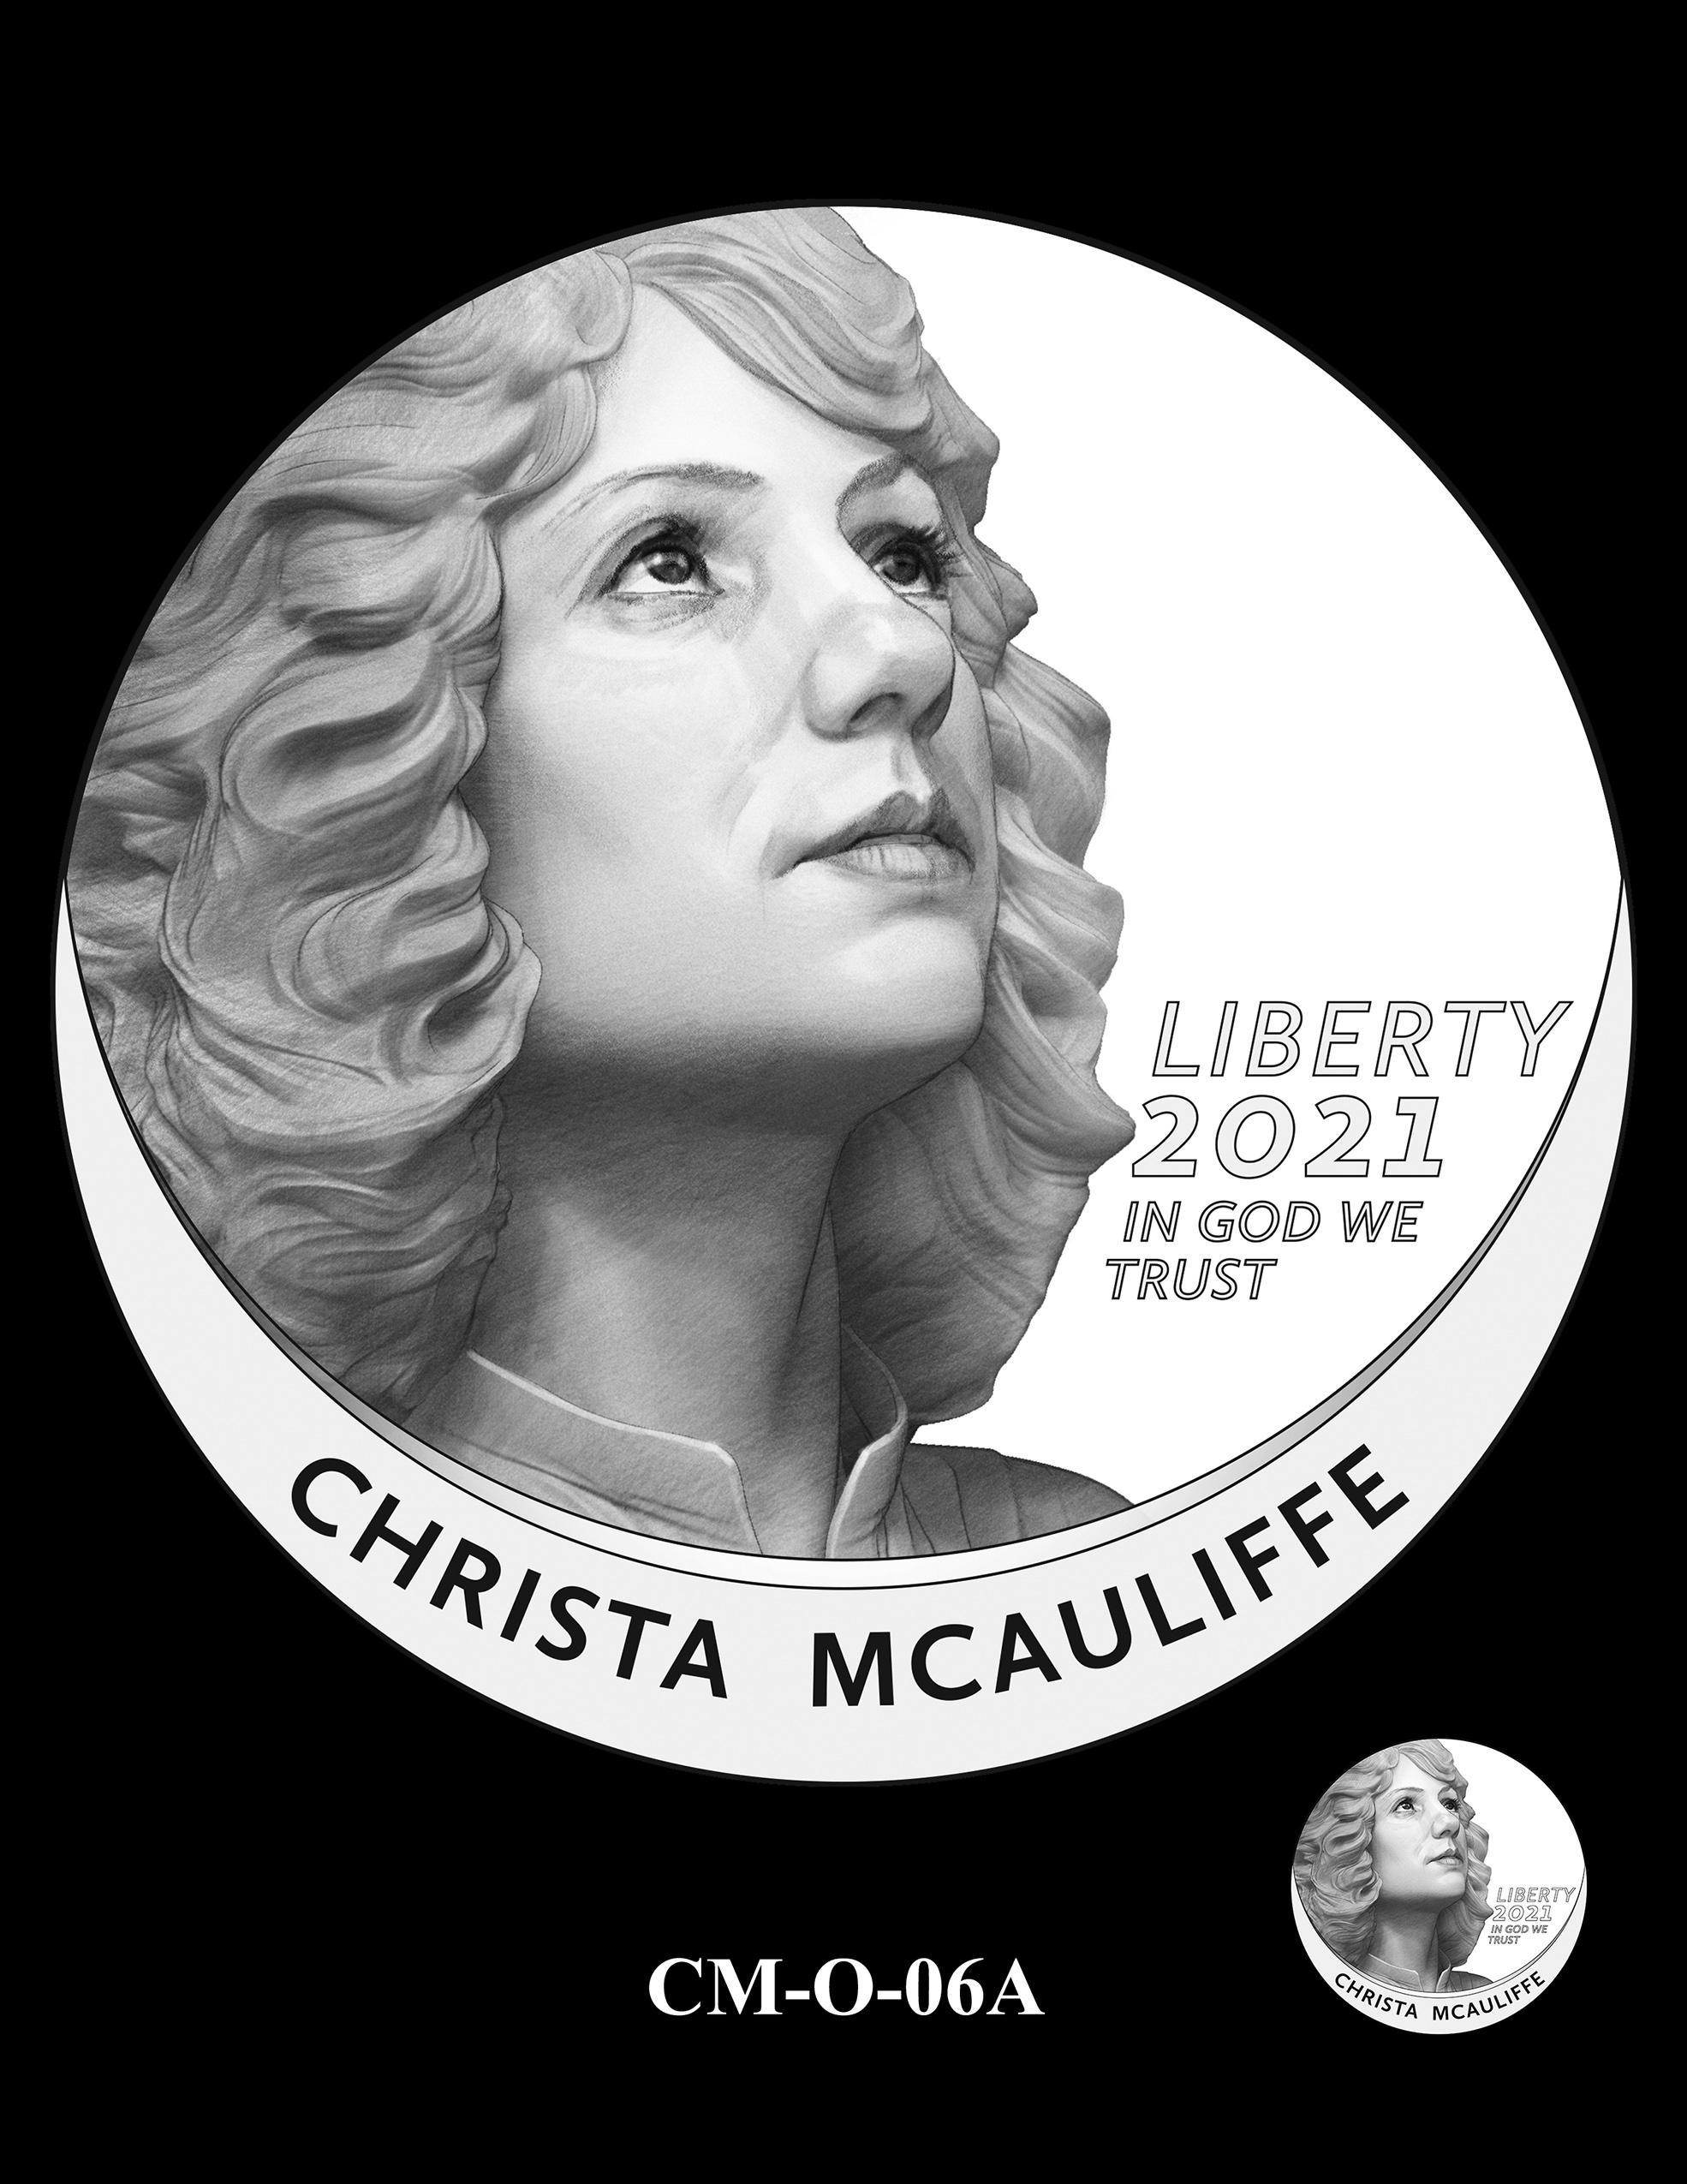 CM-O-06A -- 2021 Christa McAuliffe Commemorative Coin